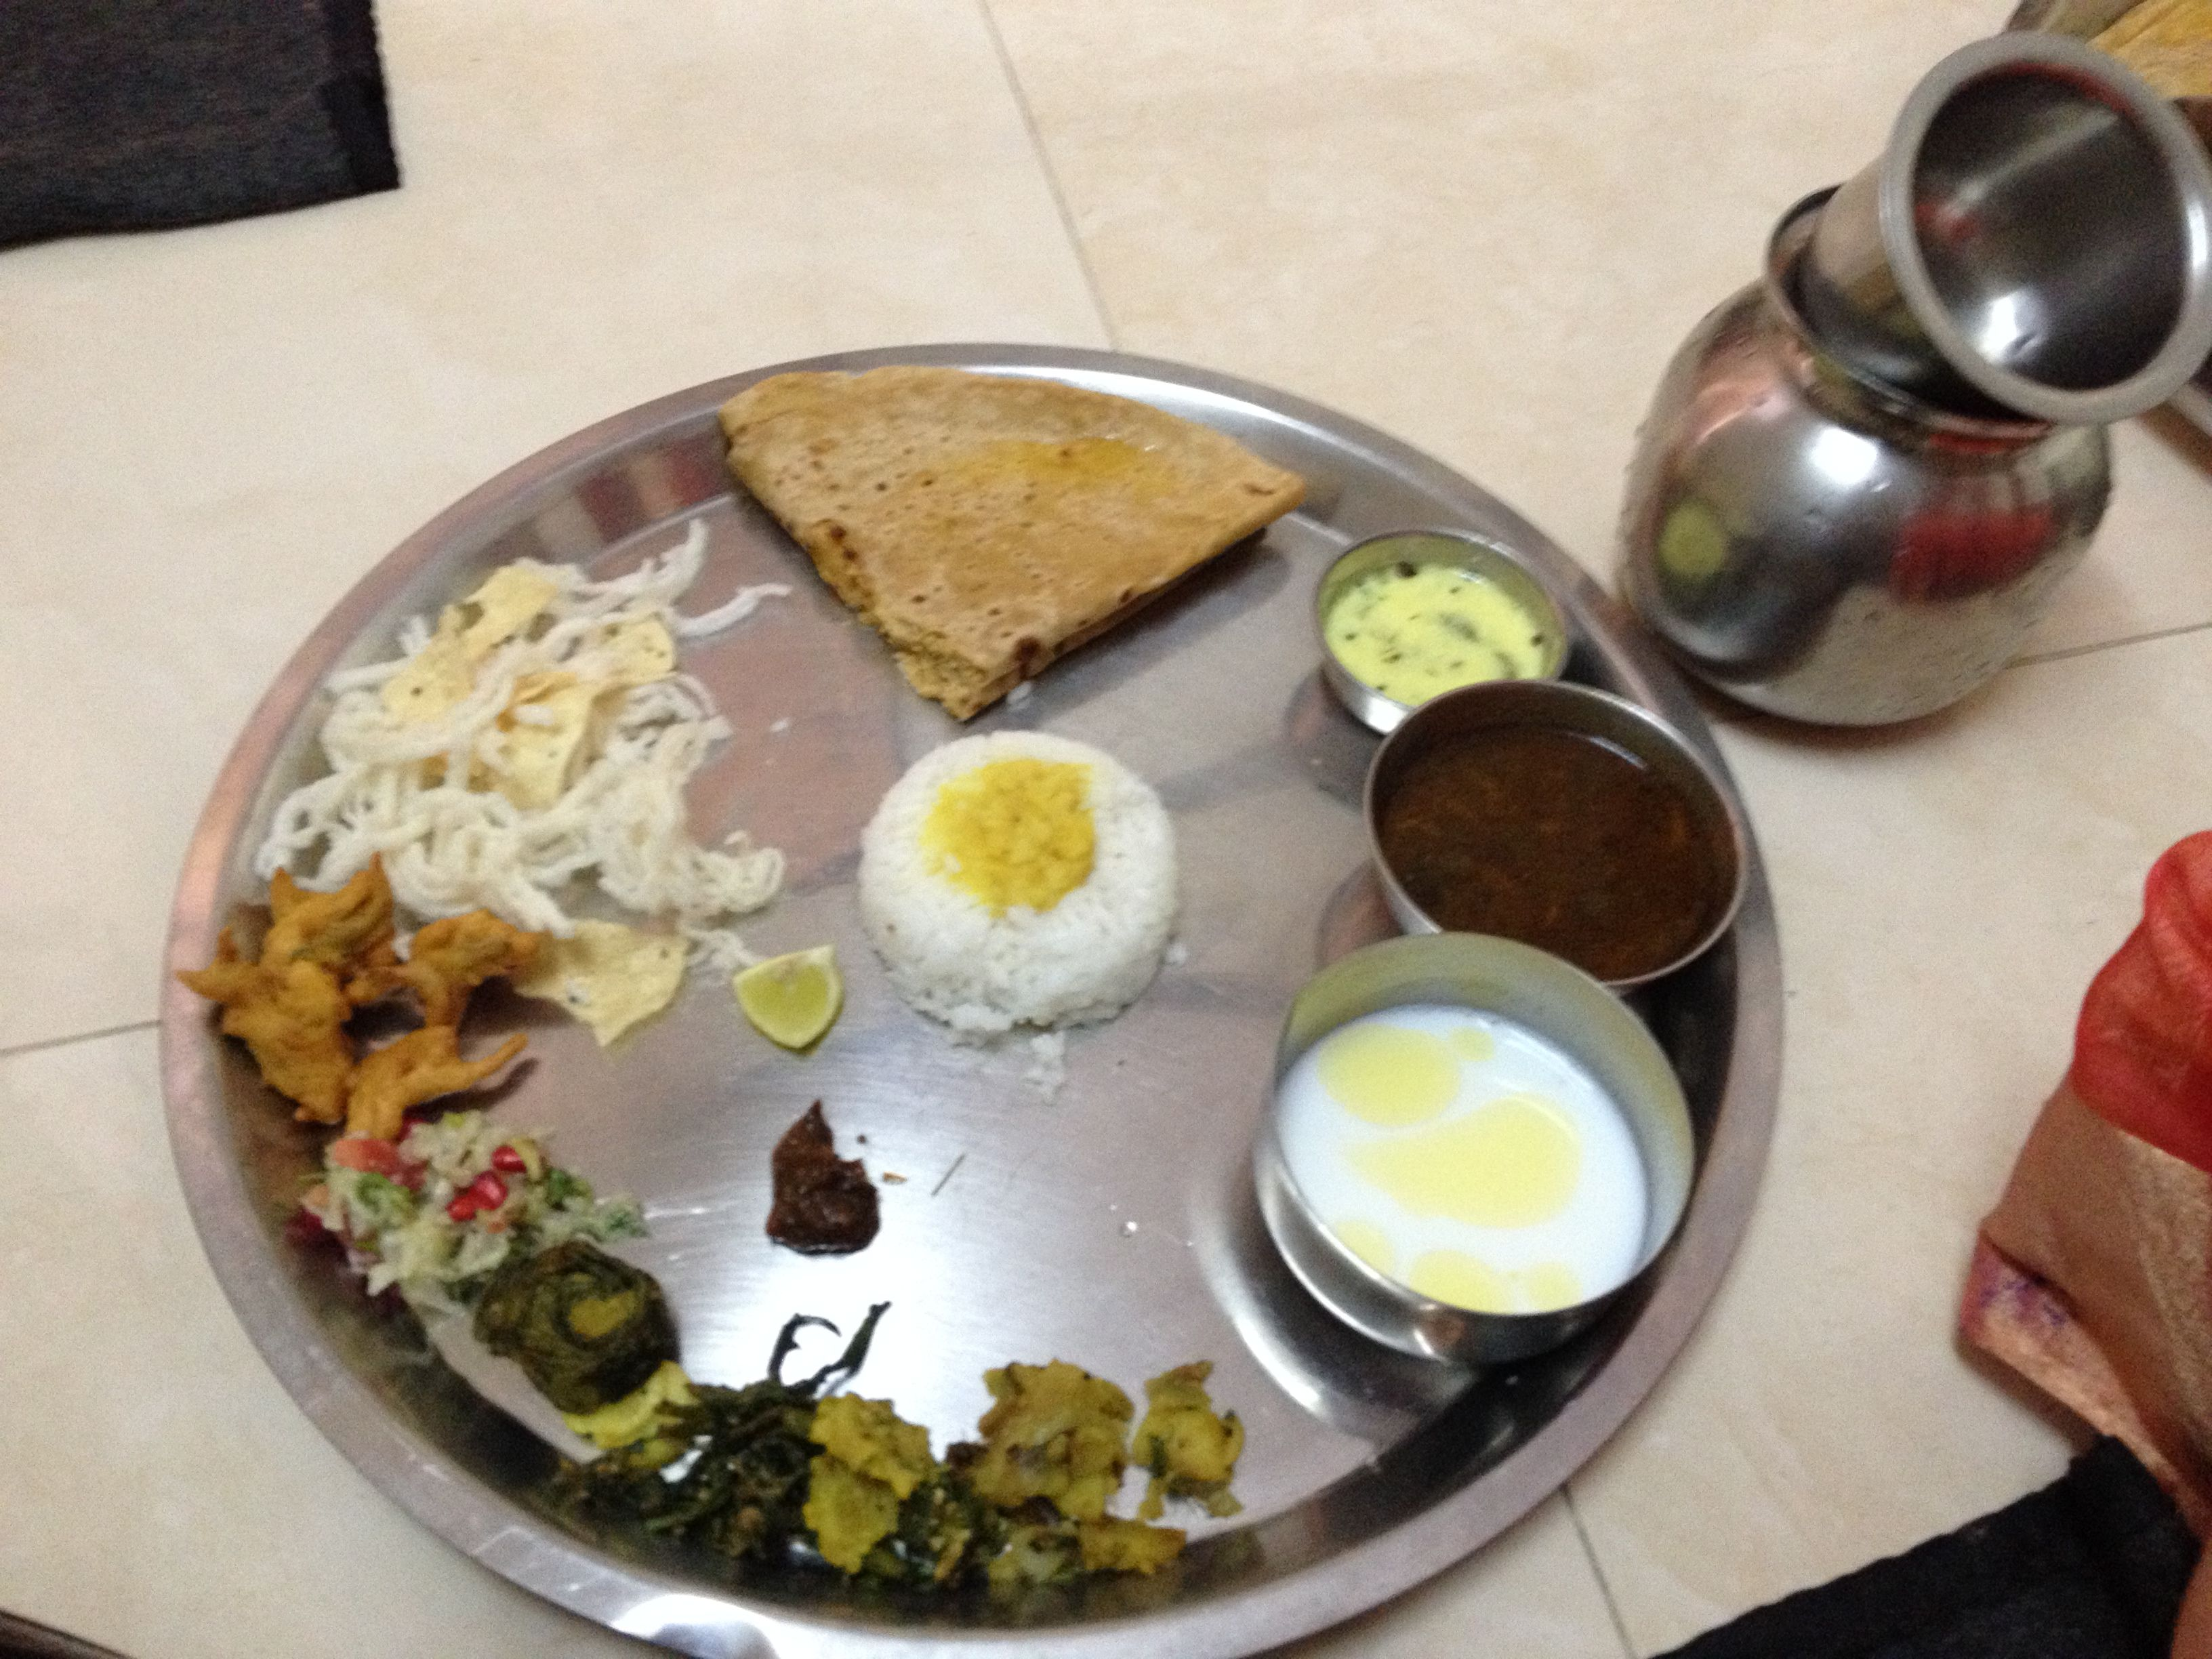 Maharashtrian thali for 'Gauri Pooja' ( Marathi thali during prayers offered to Goddess 'Gauri'- mother of Ganesha) The bread is called 'Puran-poli' ( stuffing of jiggery,bengal gram,saffron, cardamom)